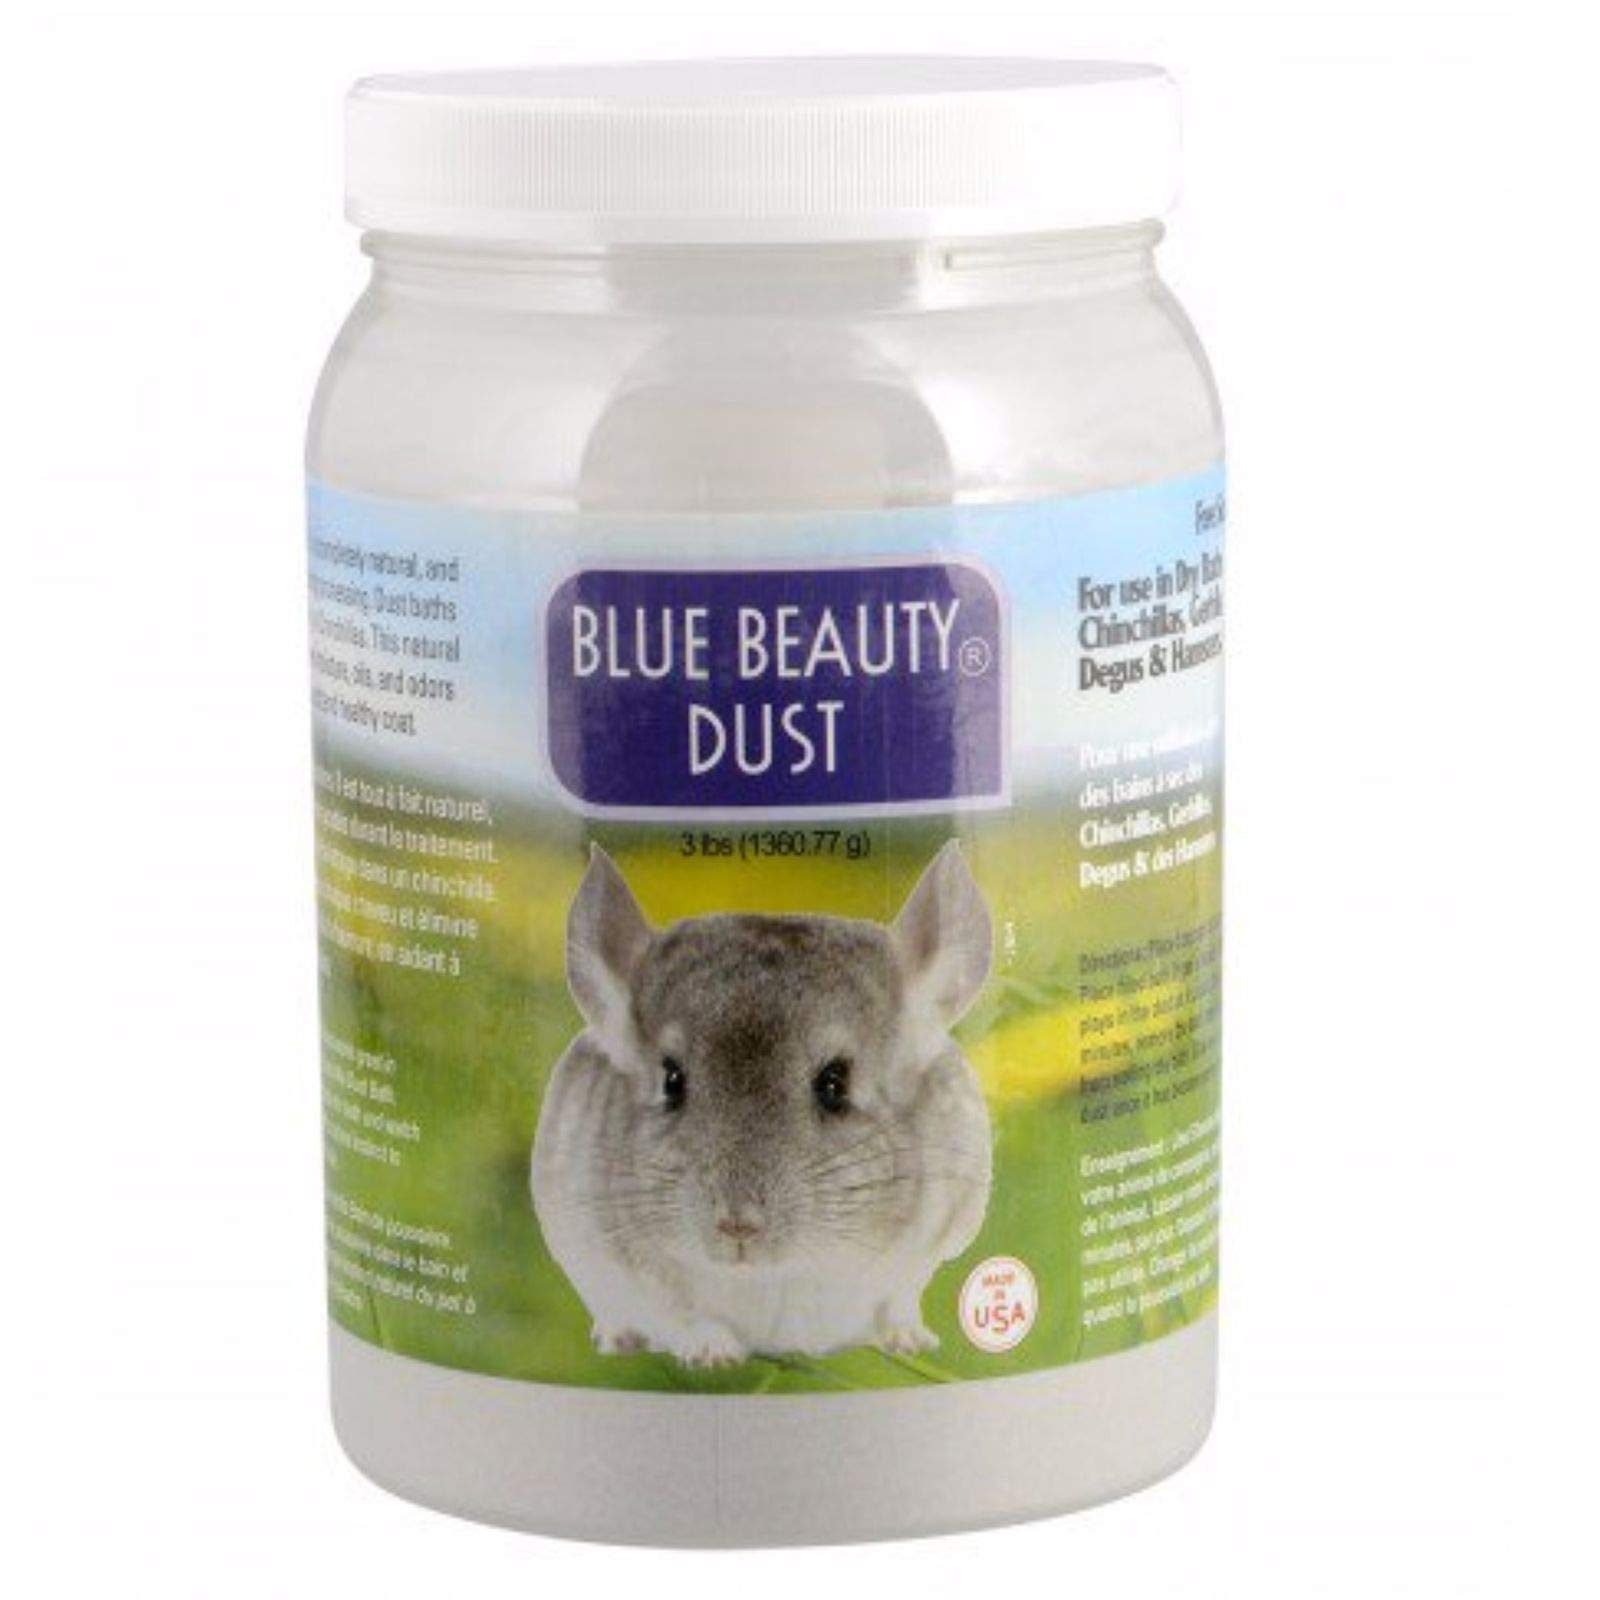 Lixit Blue Beauty Dust (3 lb) for Chinchilla Dry Bath Fine Aluminum Silicate